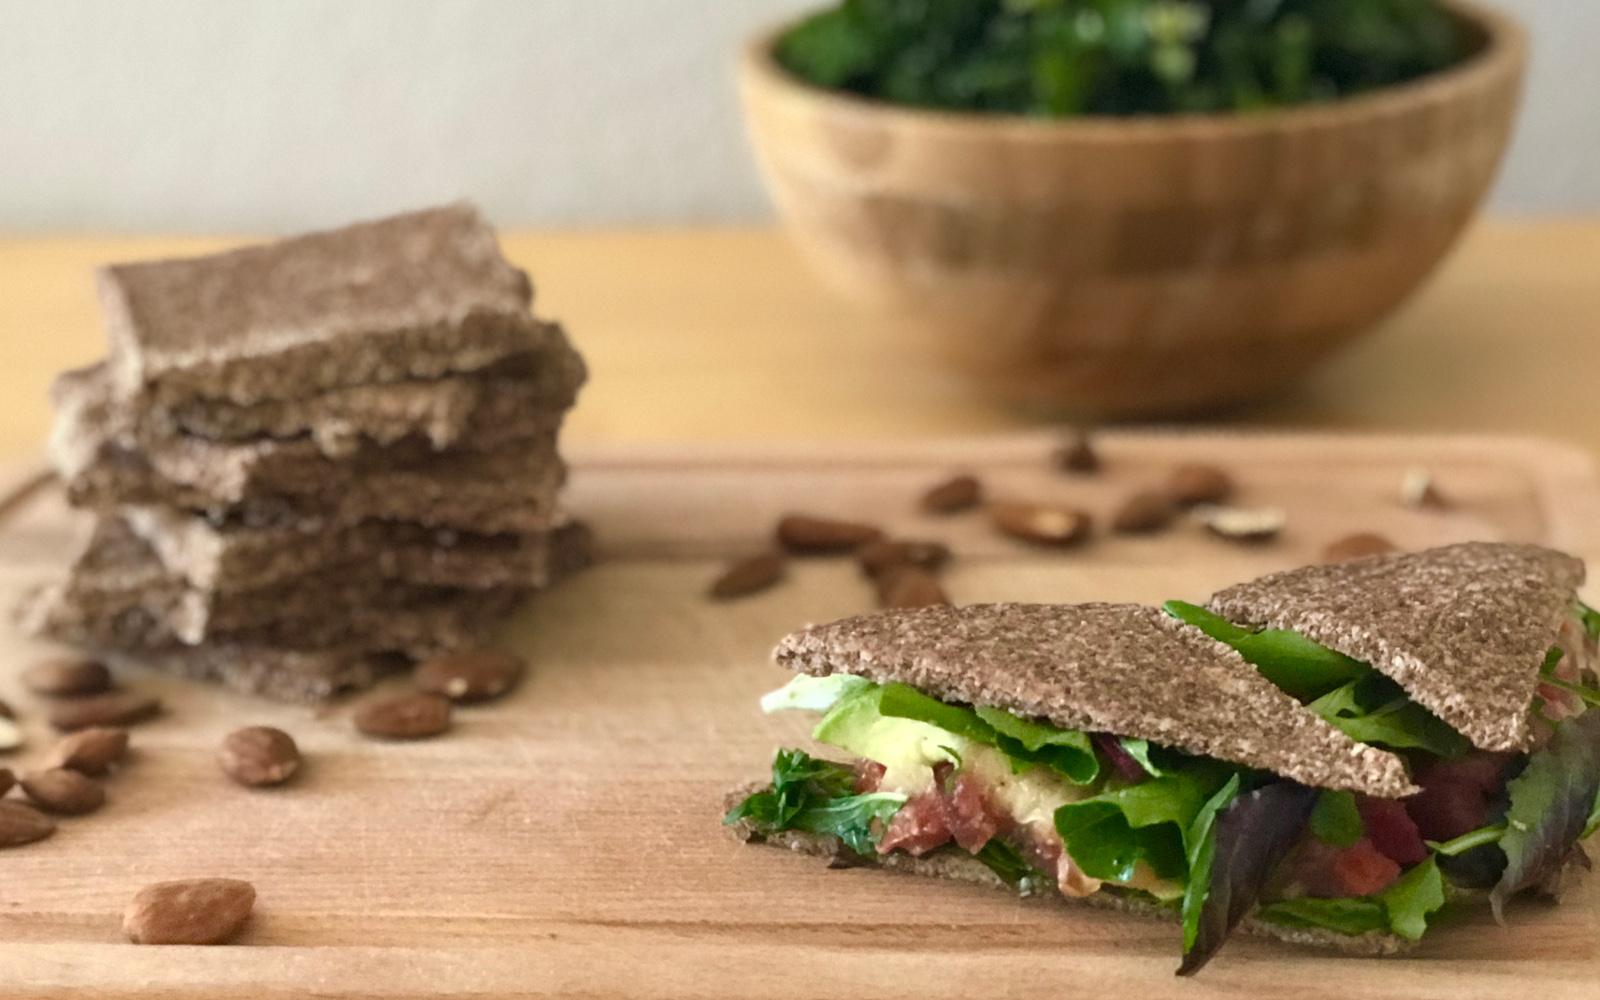 Vegan, Gluten-Free, Paleo Dehydrated Almond Bread with a sandwhich